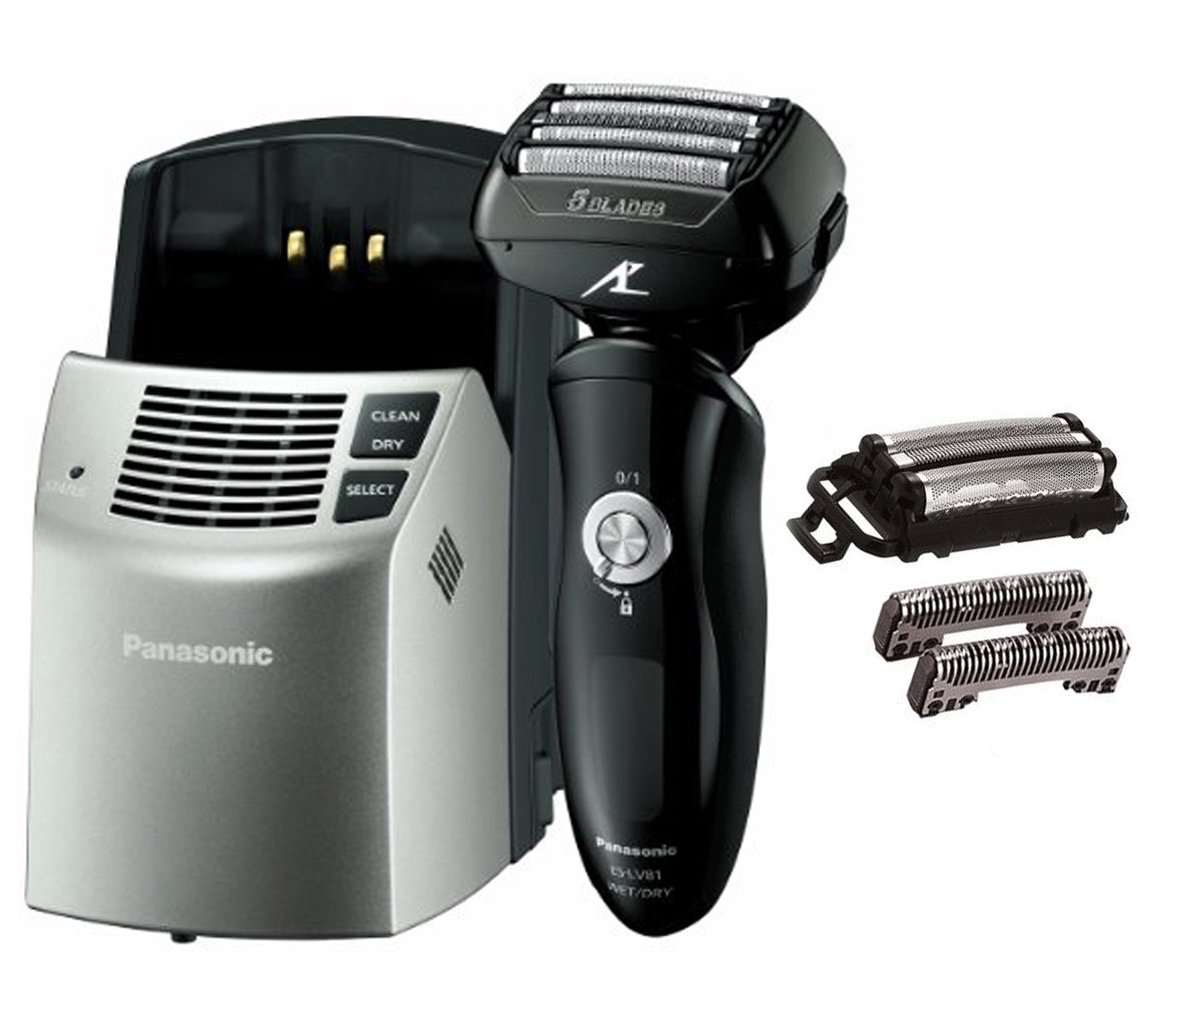 Panasonic ARC5 Blade Shaver w/ Auto Cleaner & Electric Razor Replacement Set